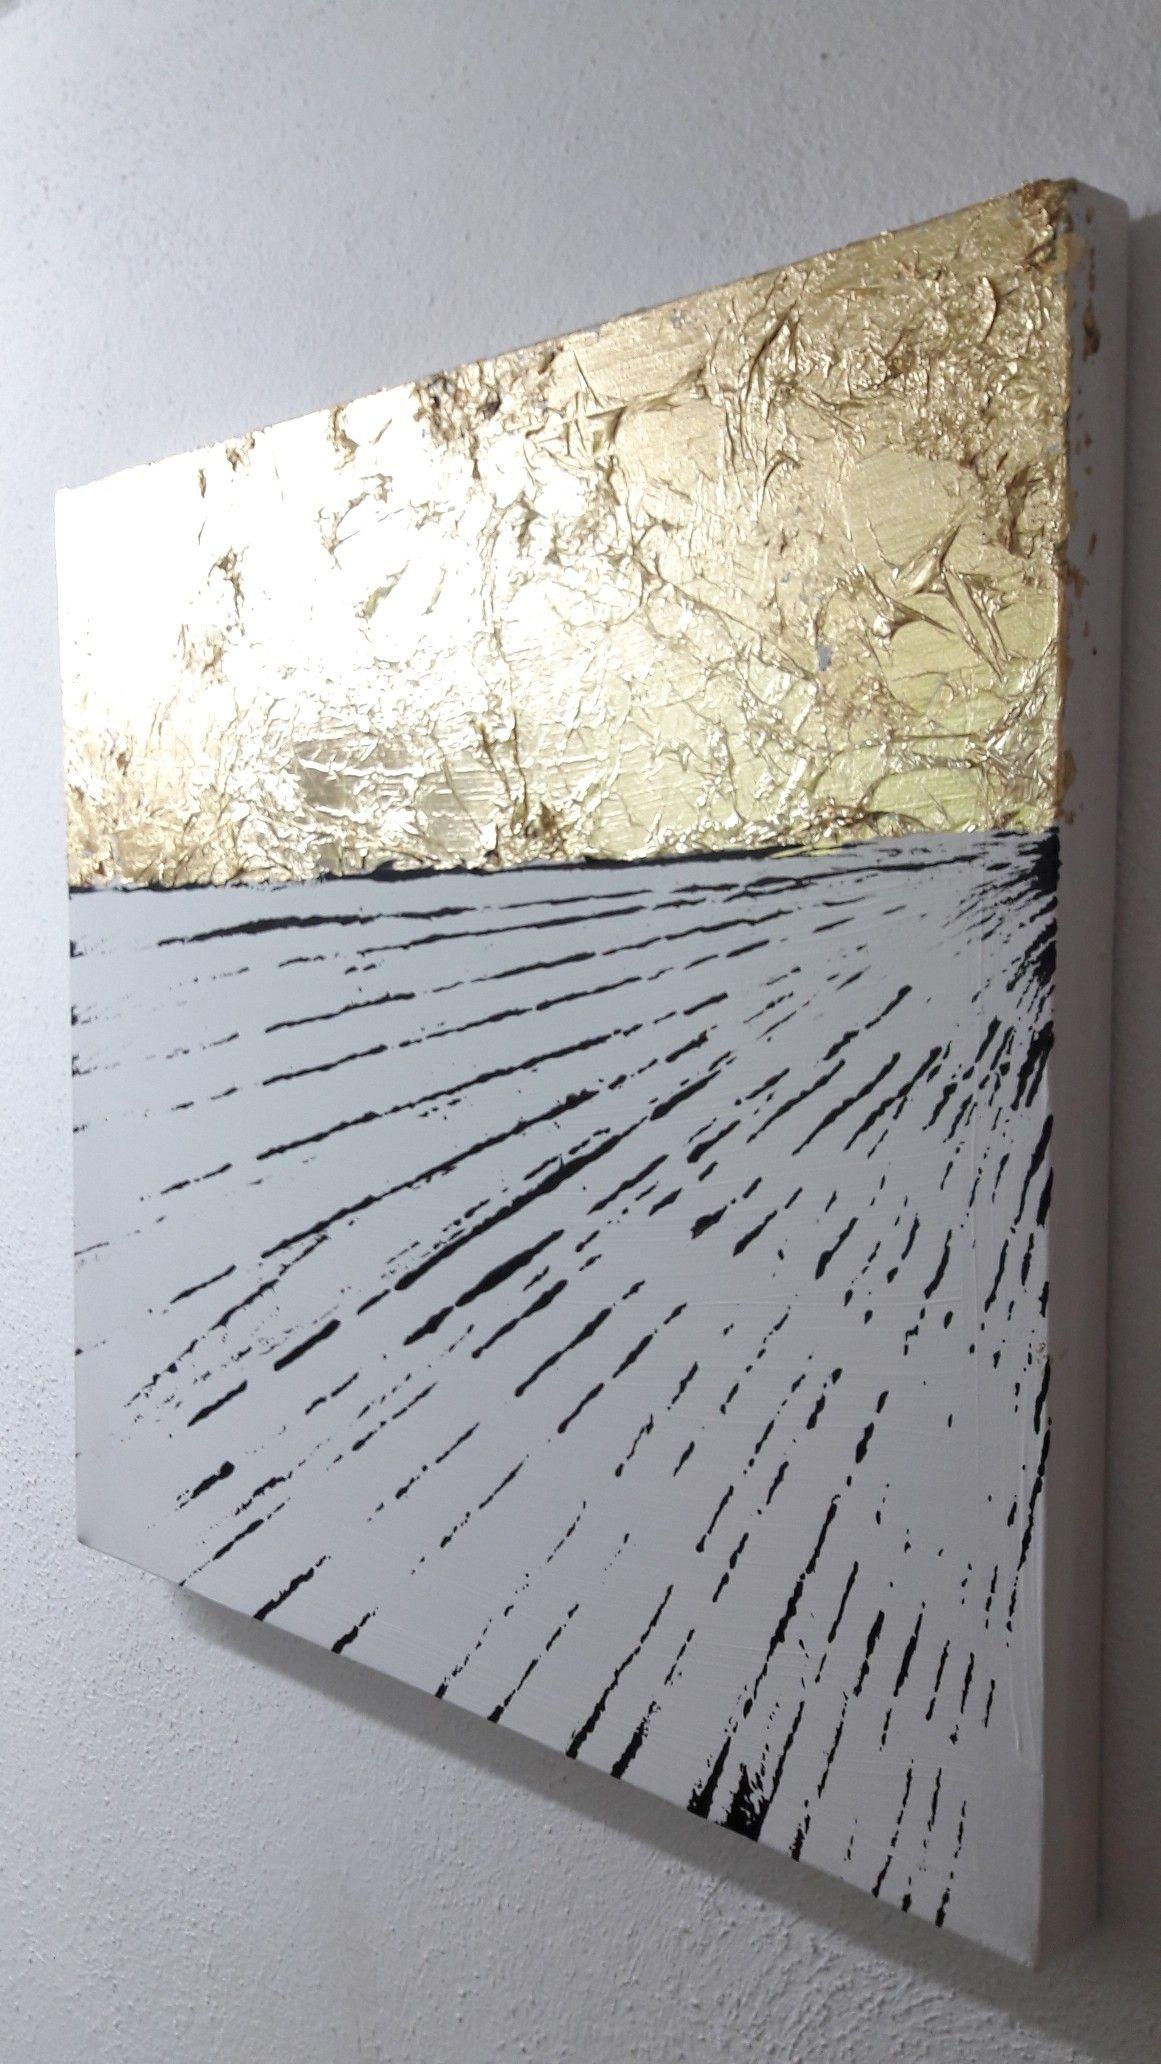 schwarz gold weiss malerei inspiration abstrakt abstrakte etsy kunst acryl leinwand